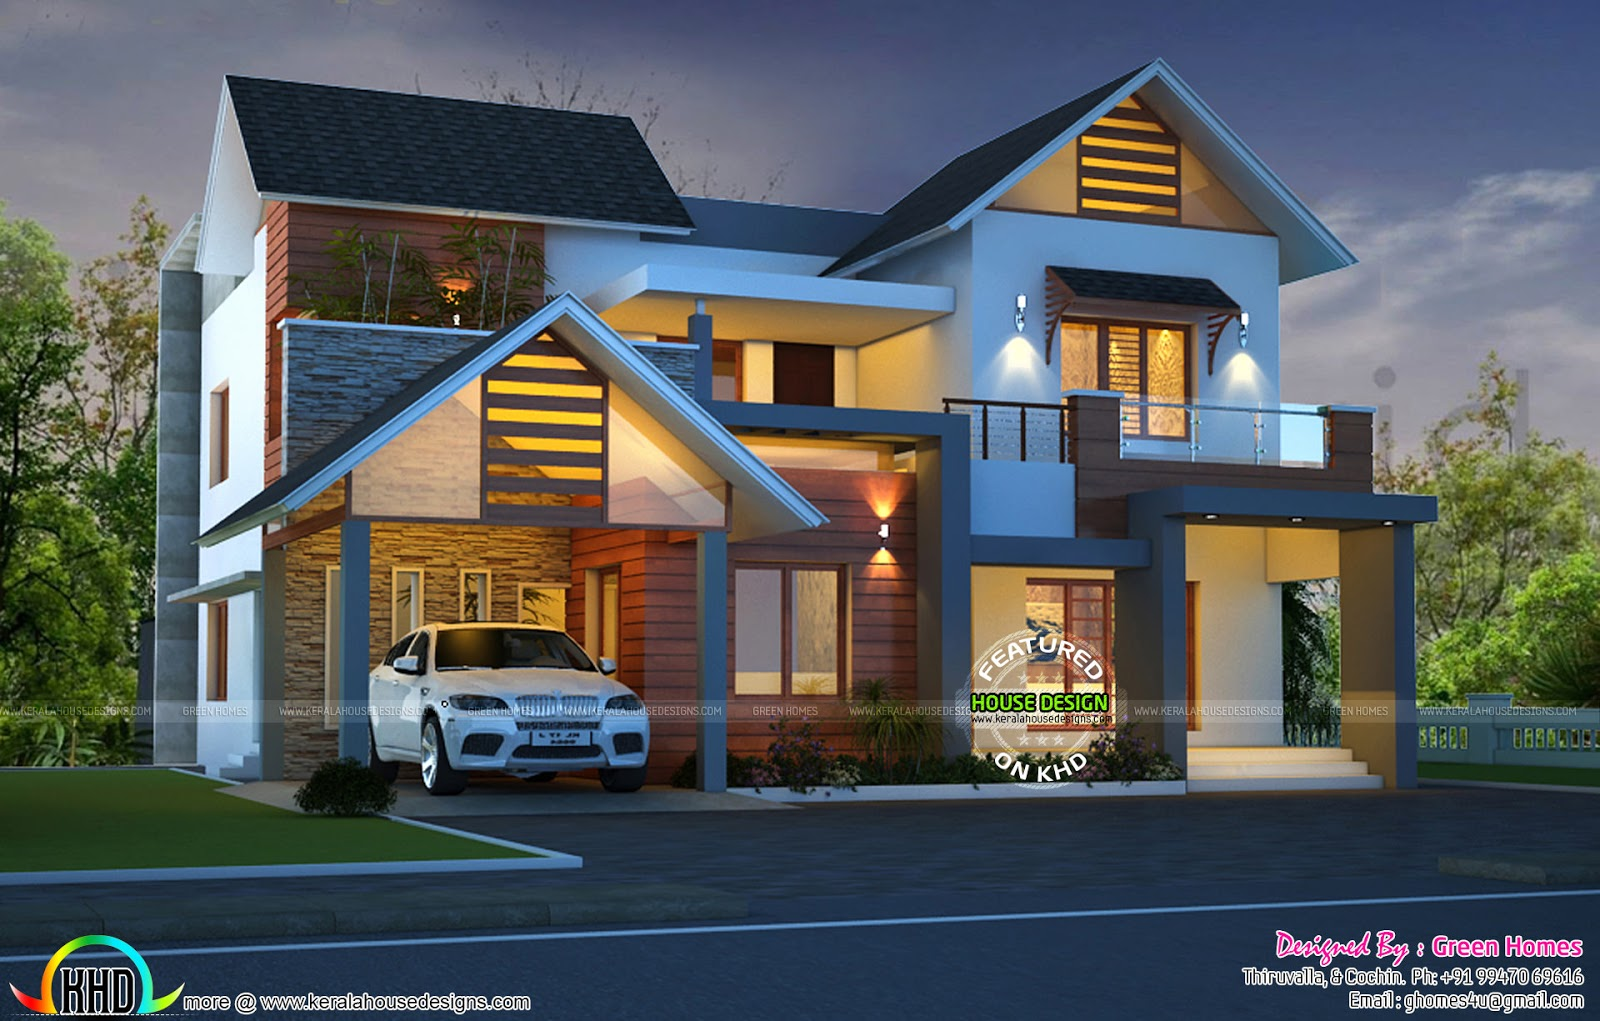 Cute night view Kerala home design | Kerala home design | Bloglovin'